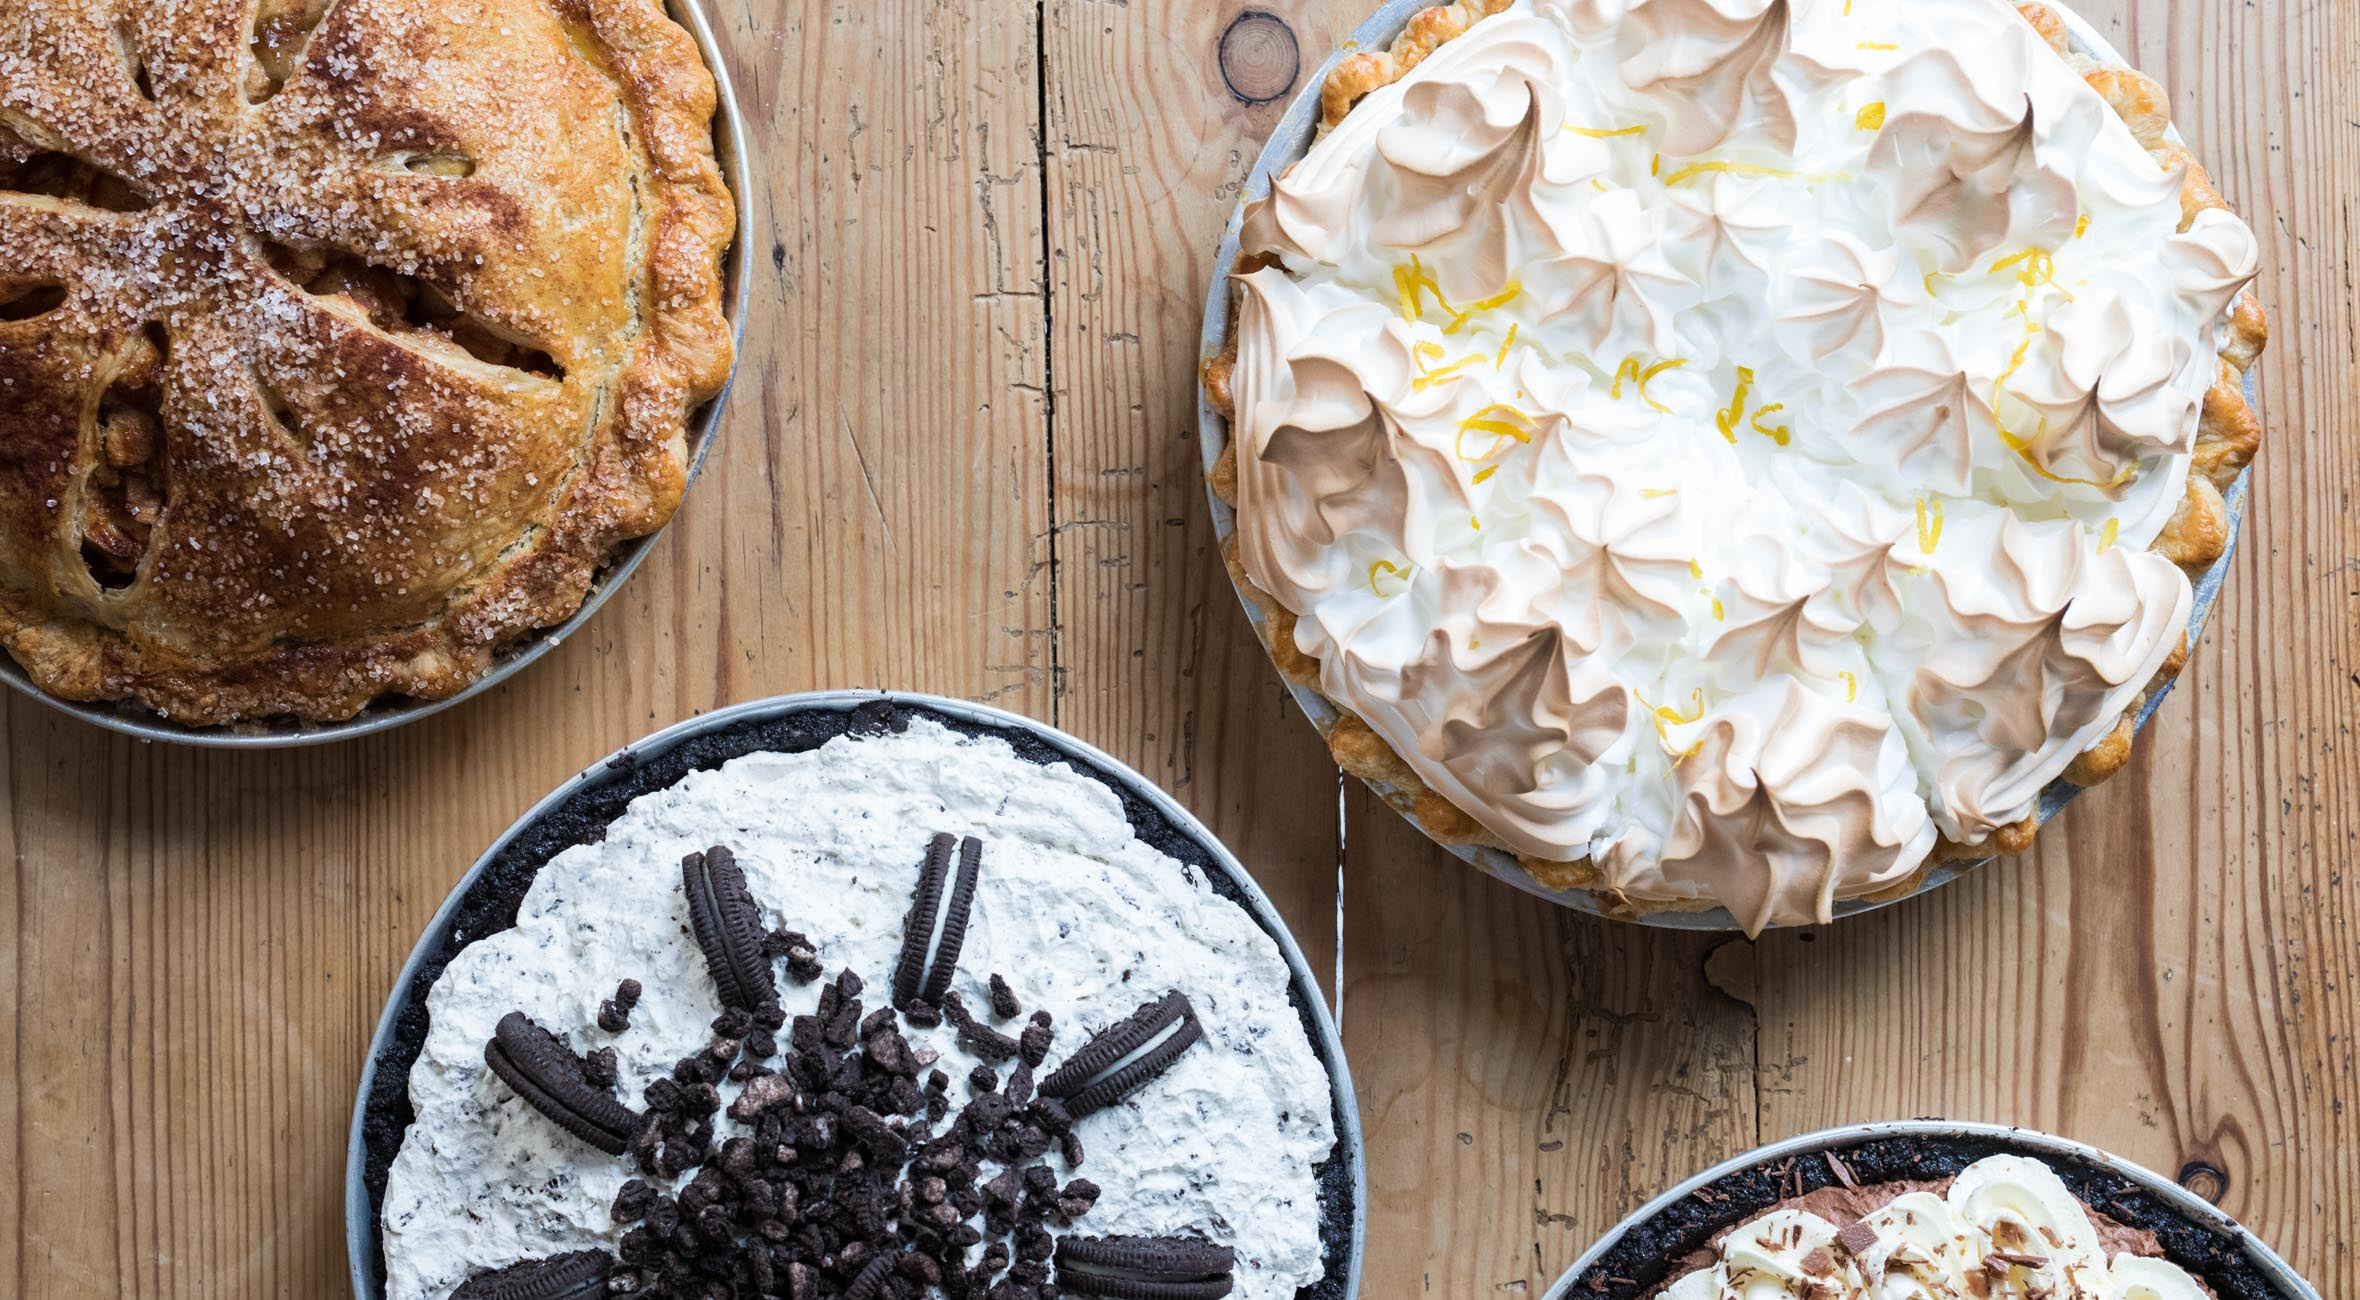 Frit valg til alt hos The American Pie Company i Indre By – Smag byens bedste pies